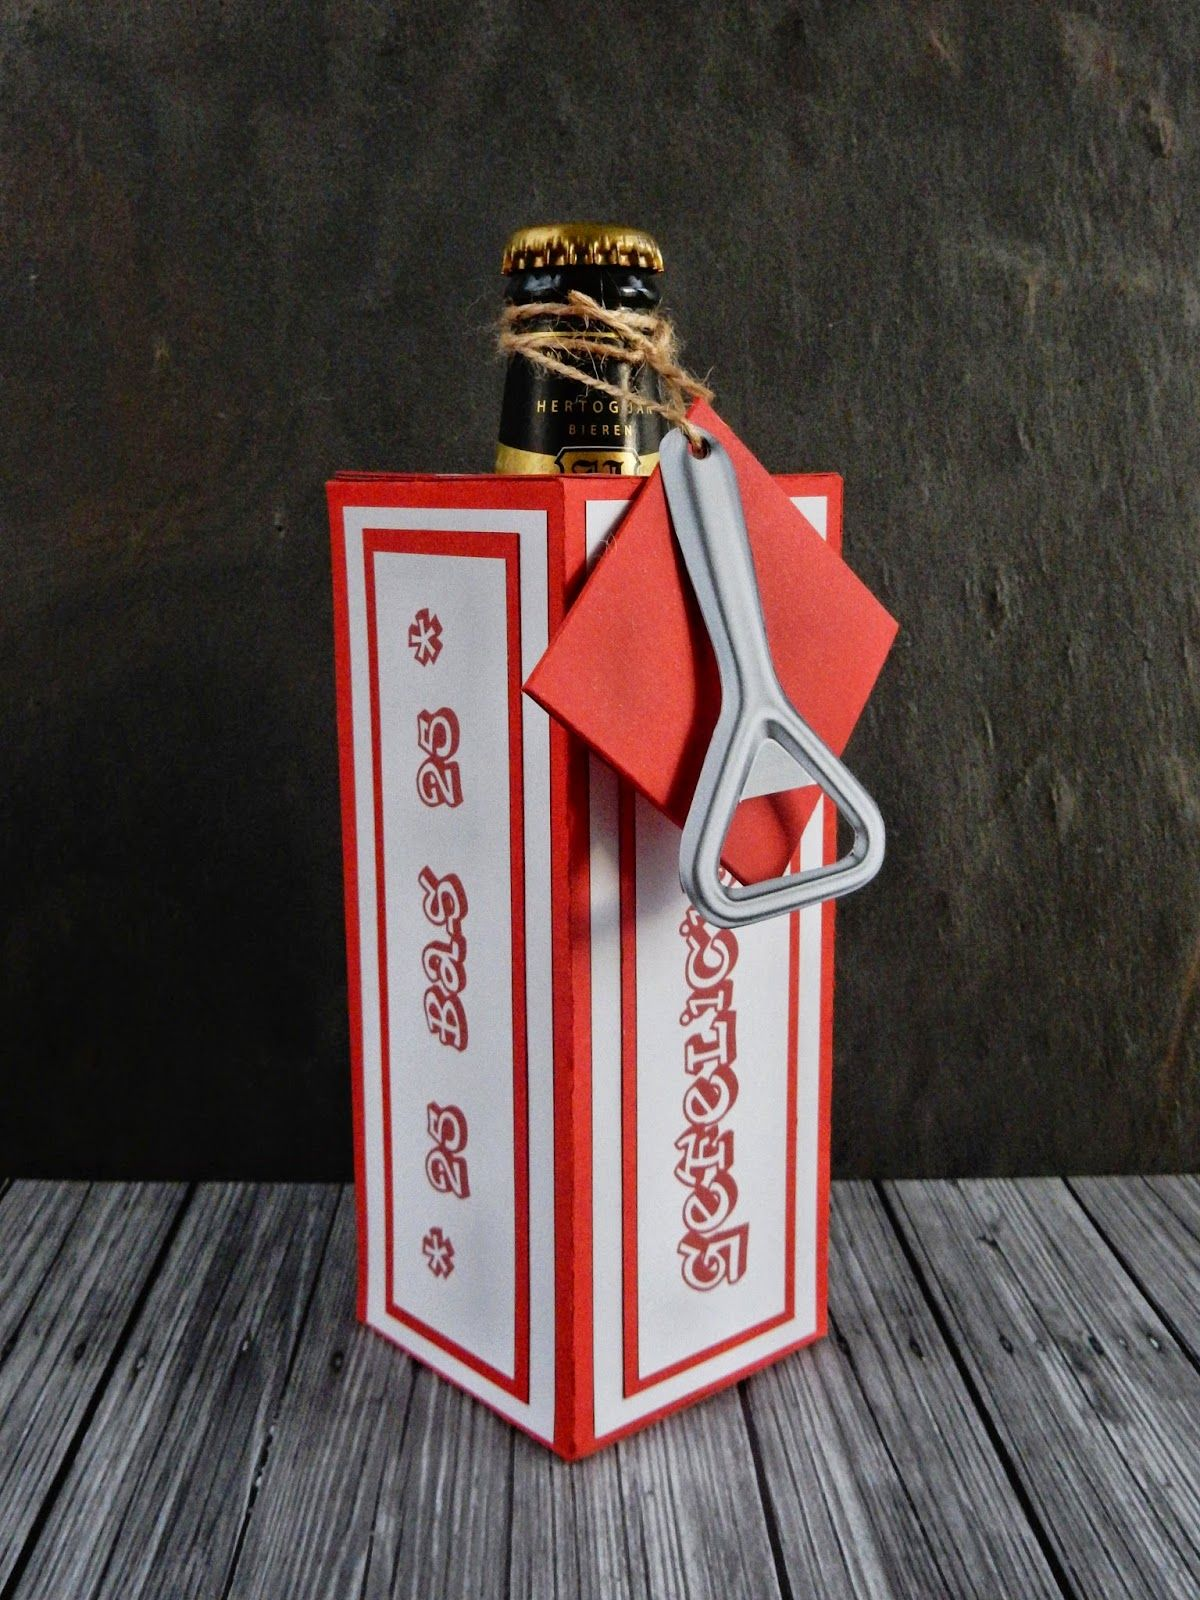 Bier Gift Box Met How To Wine Bottle Covers Gifts Bier